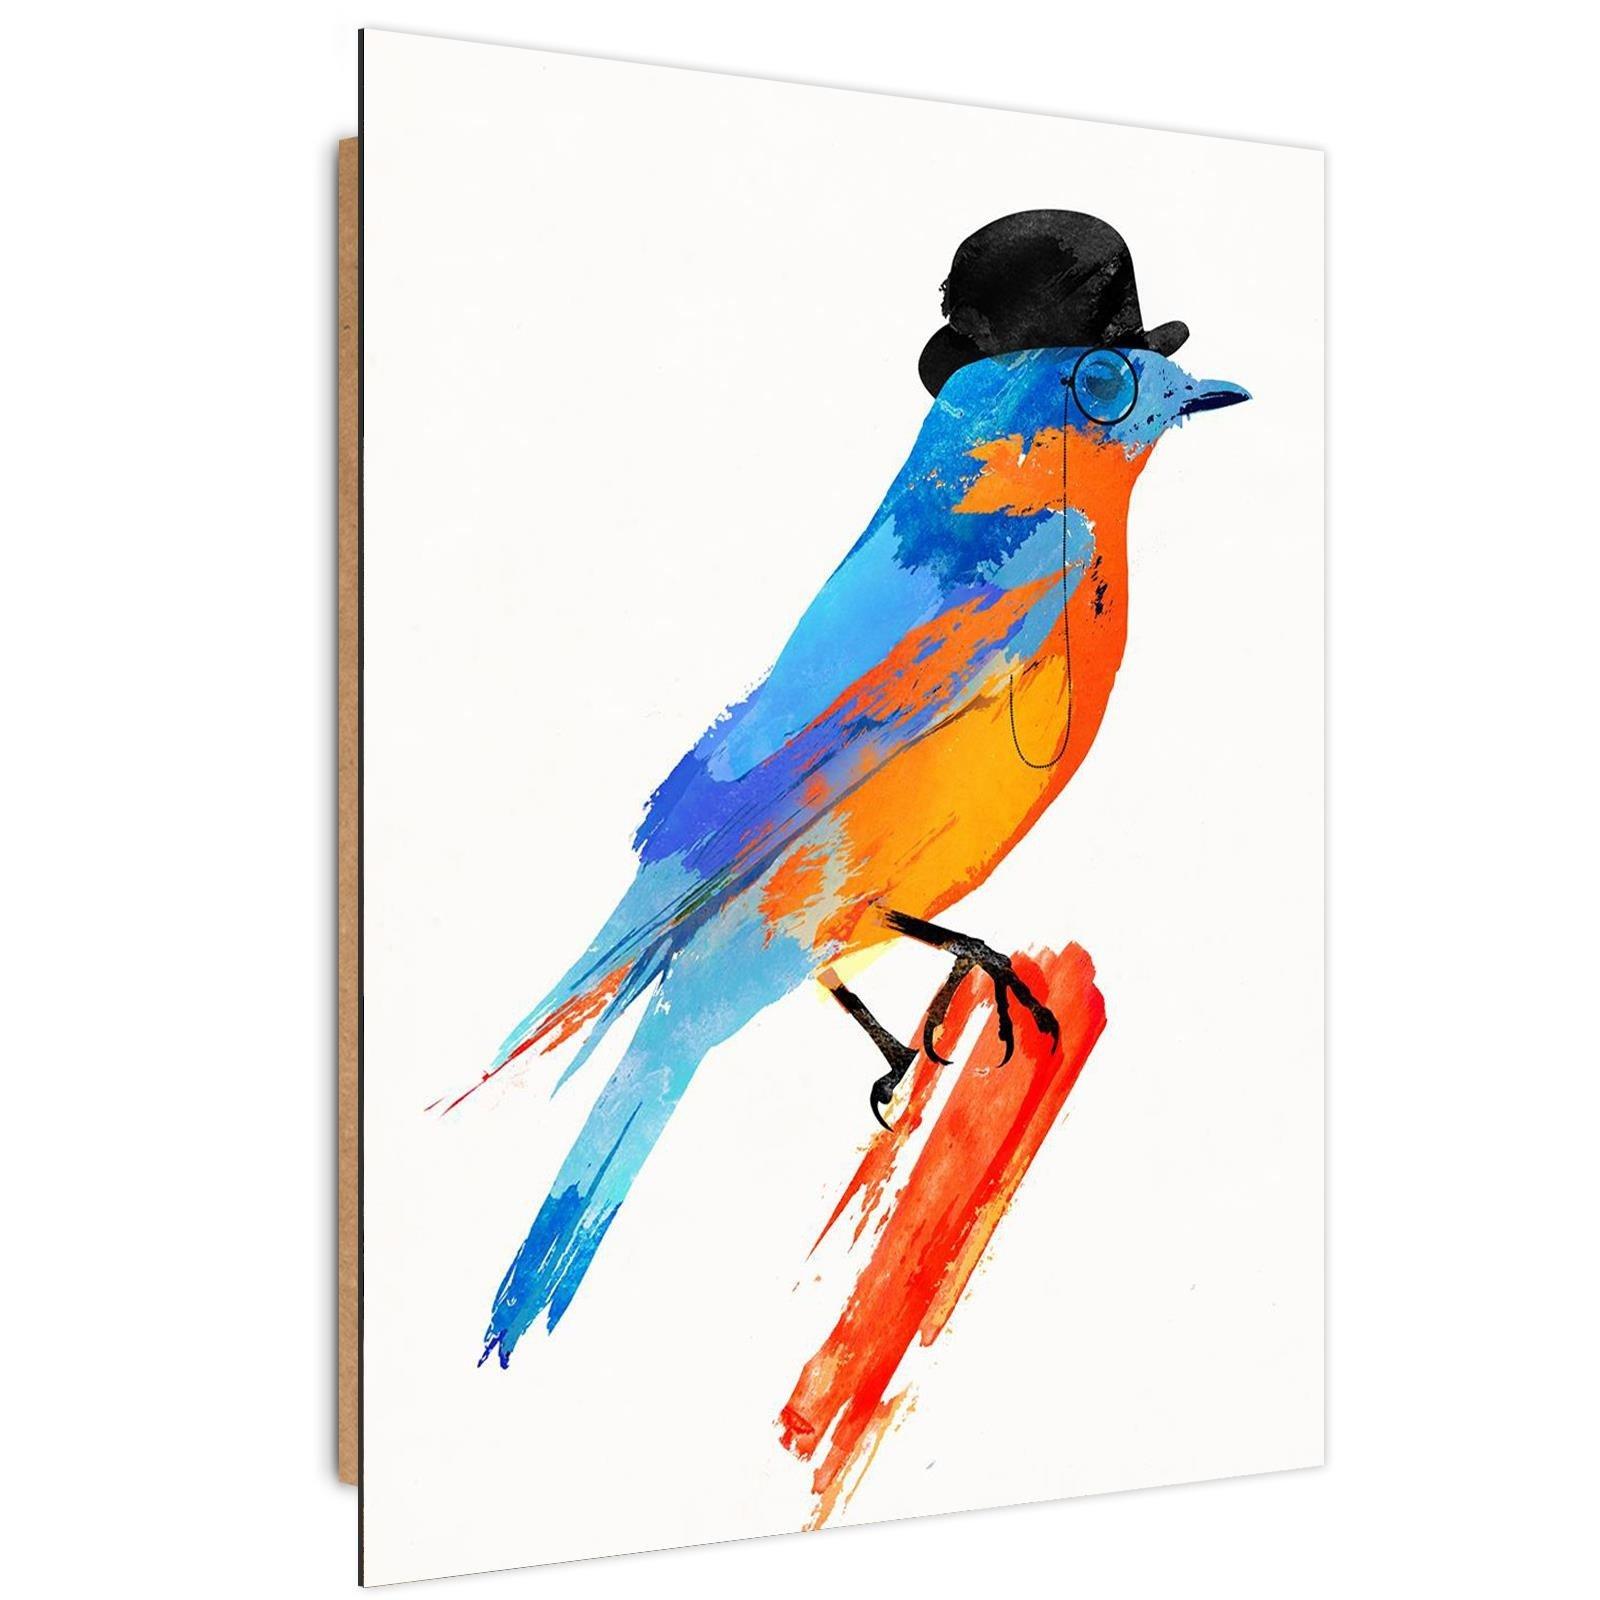 Tableau enfant bois bird in a bowler hat orange 40x60